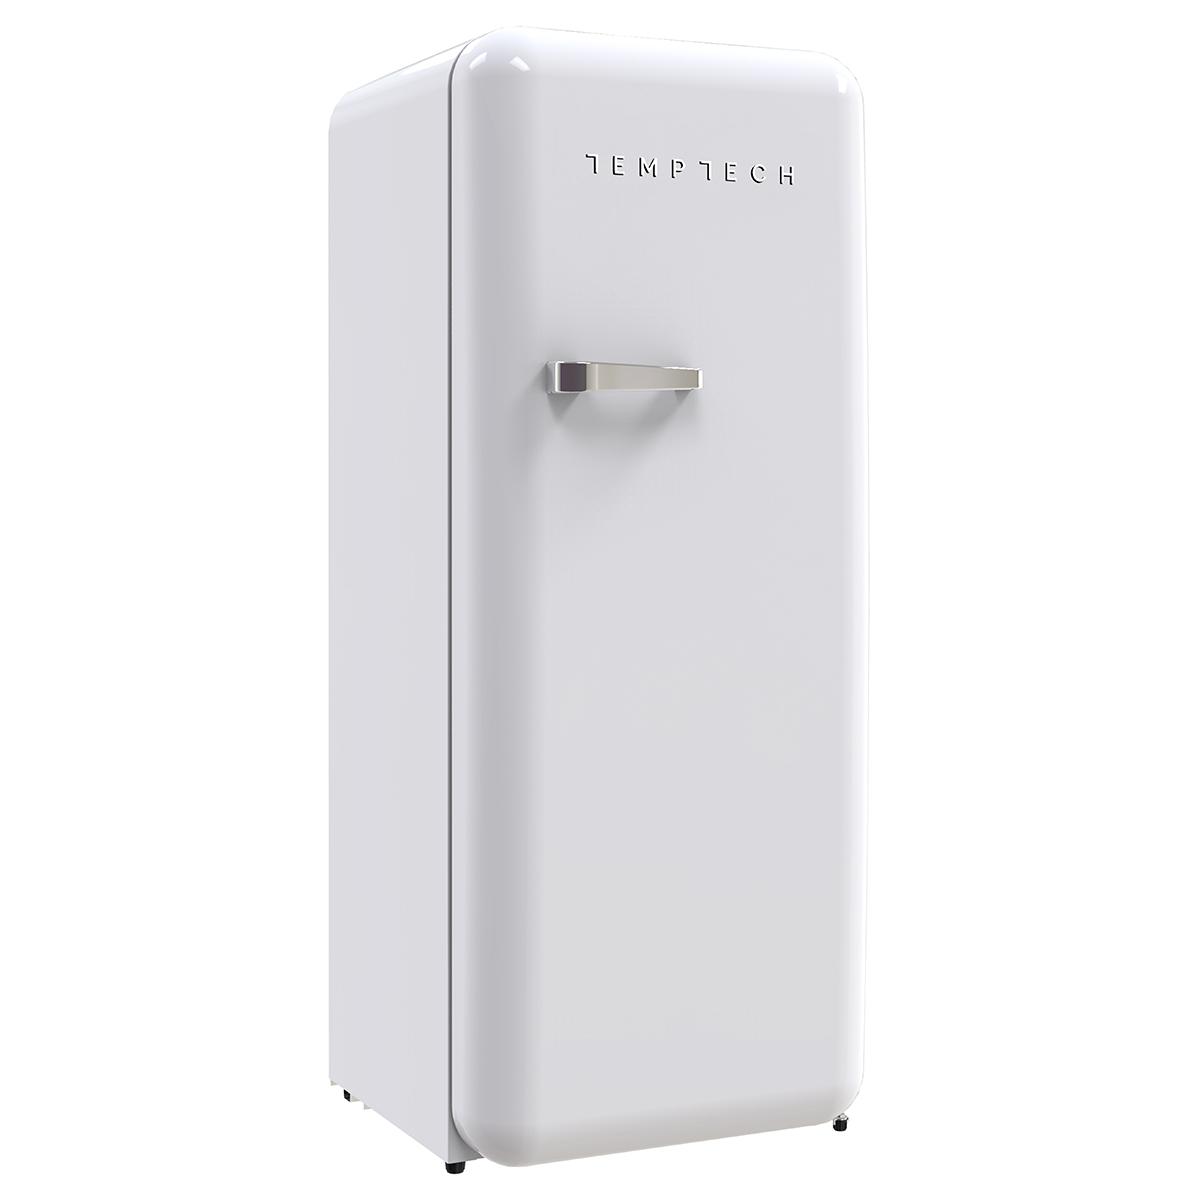 53ecf37a Kombiskap med kjøl og frys Stilig retrodesign Justerbare hyller,  flaskeholder og grønnsaksskuff Energiklasse A+